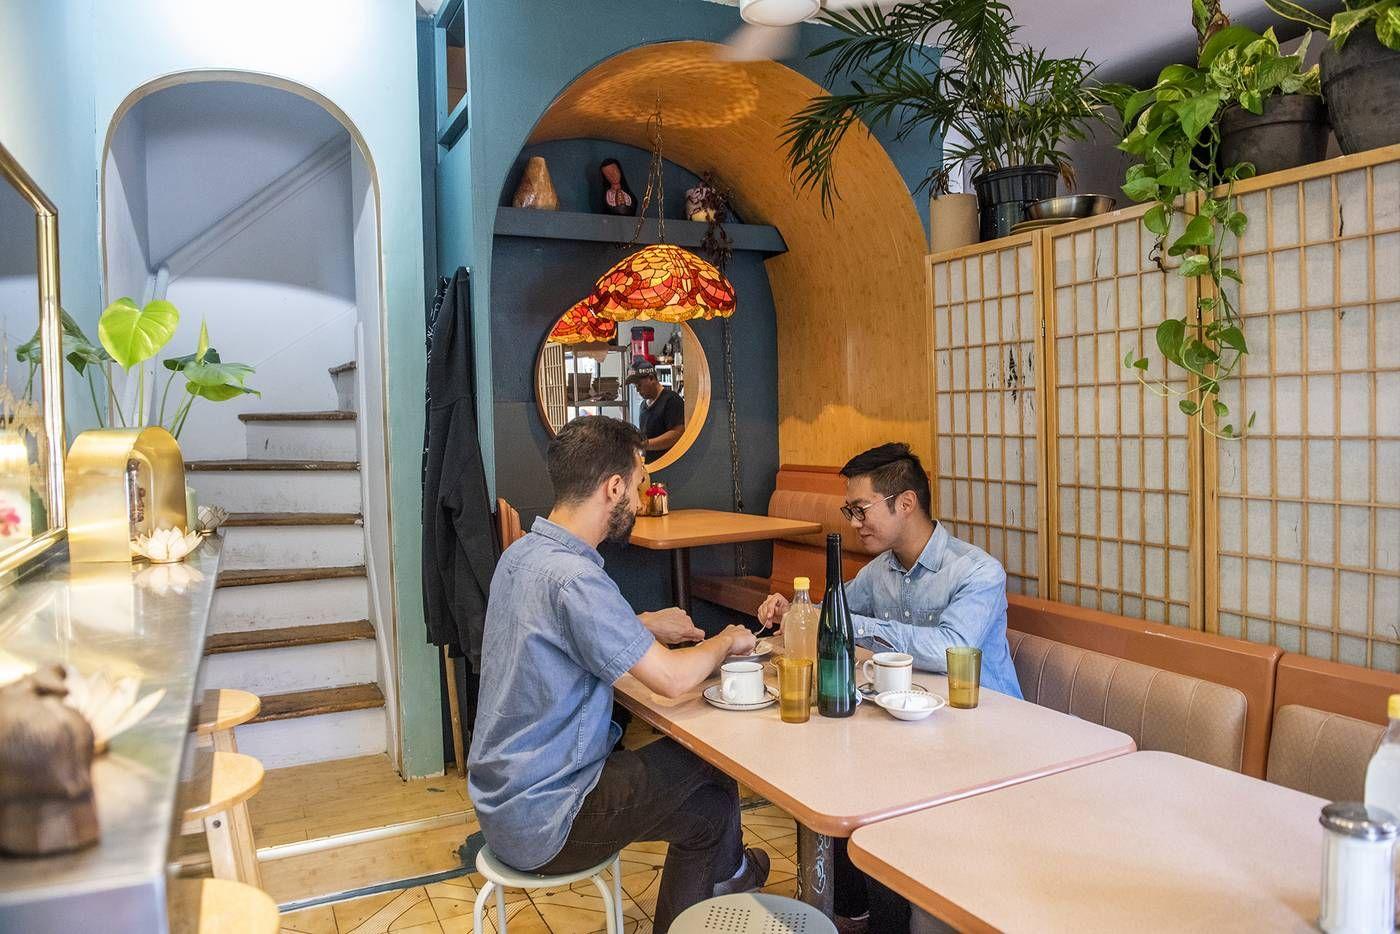 Best Brunch Bbs Diner Little Italy 76 Lippincott St Tucked Next Door To Aunties And Uncles This Filipino Brunch Spo Toronto Restaurants Restaurant Diner